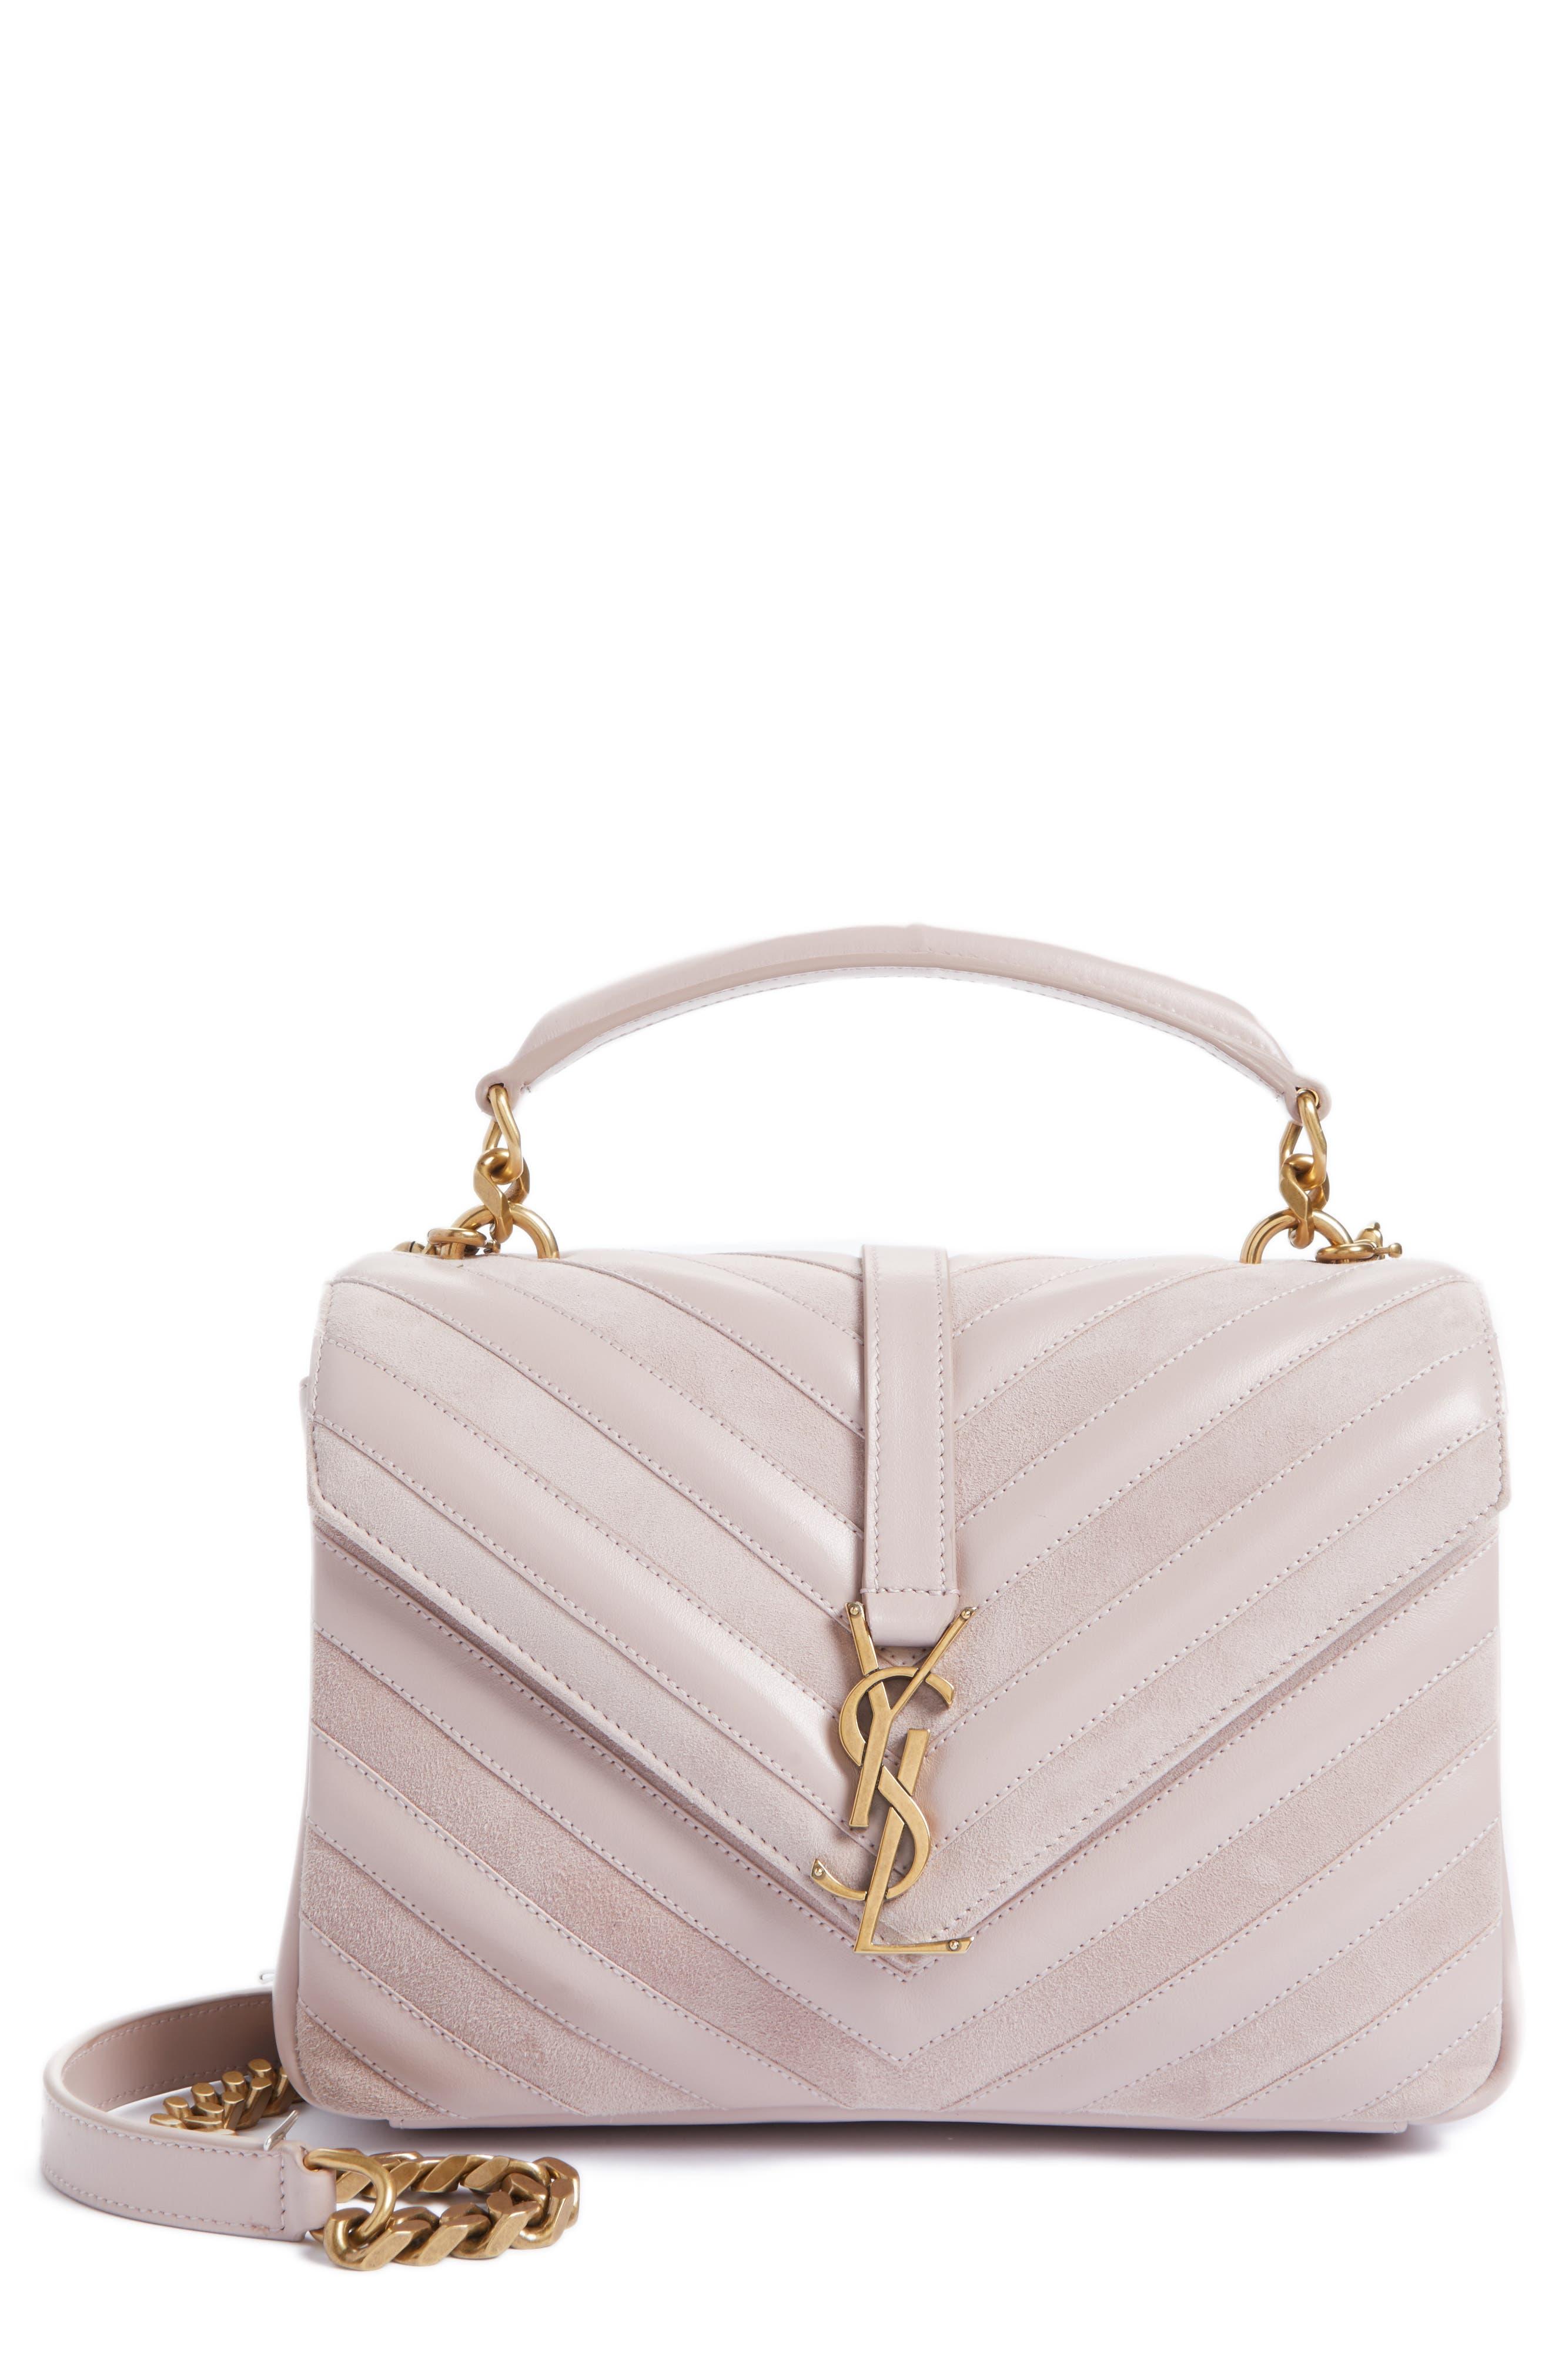 Main Image - Saint Laurent Medium College Patchwork Suede & Leather Shoulder Bag